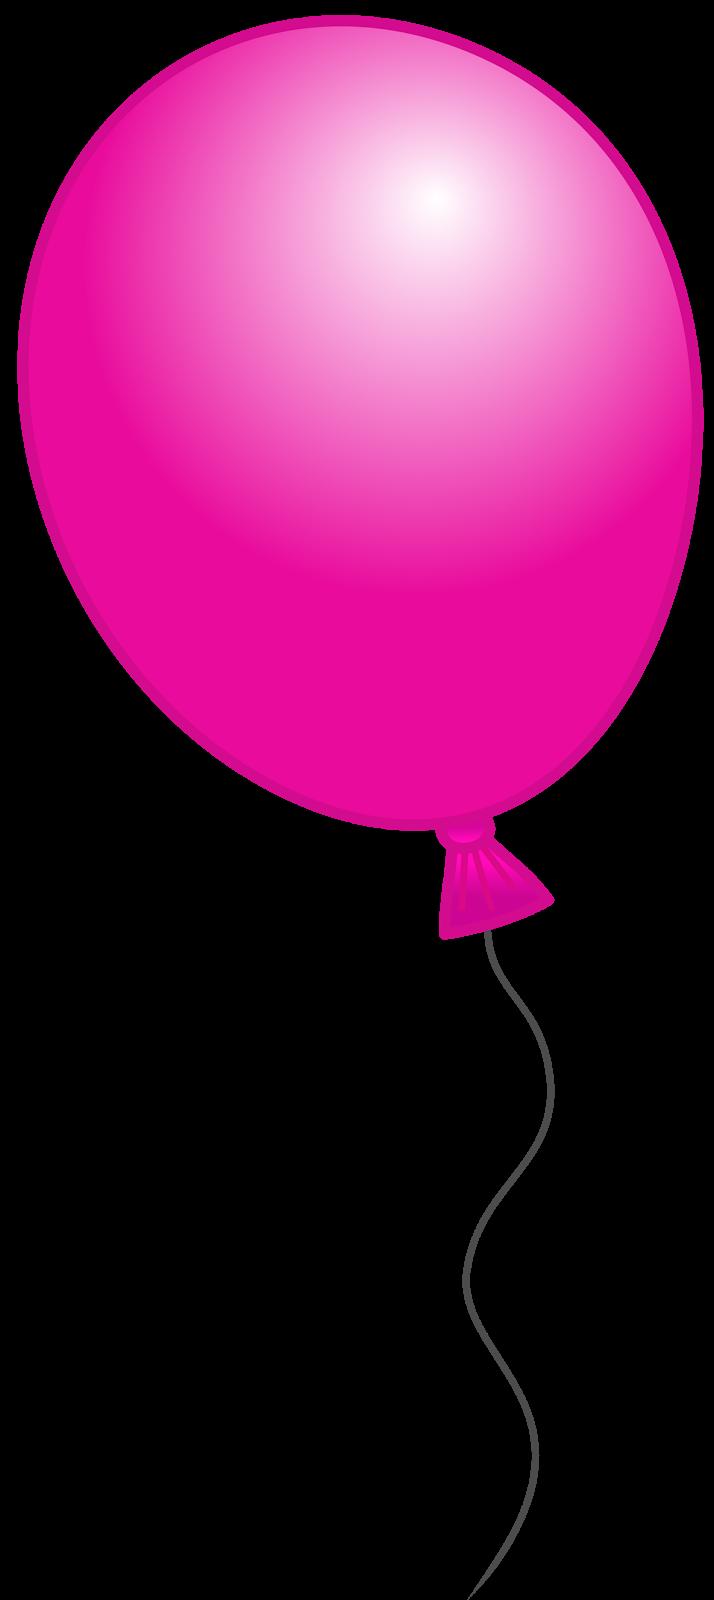 Pink Balloon Clipart.